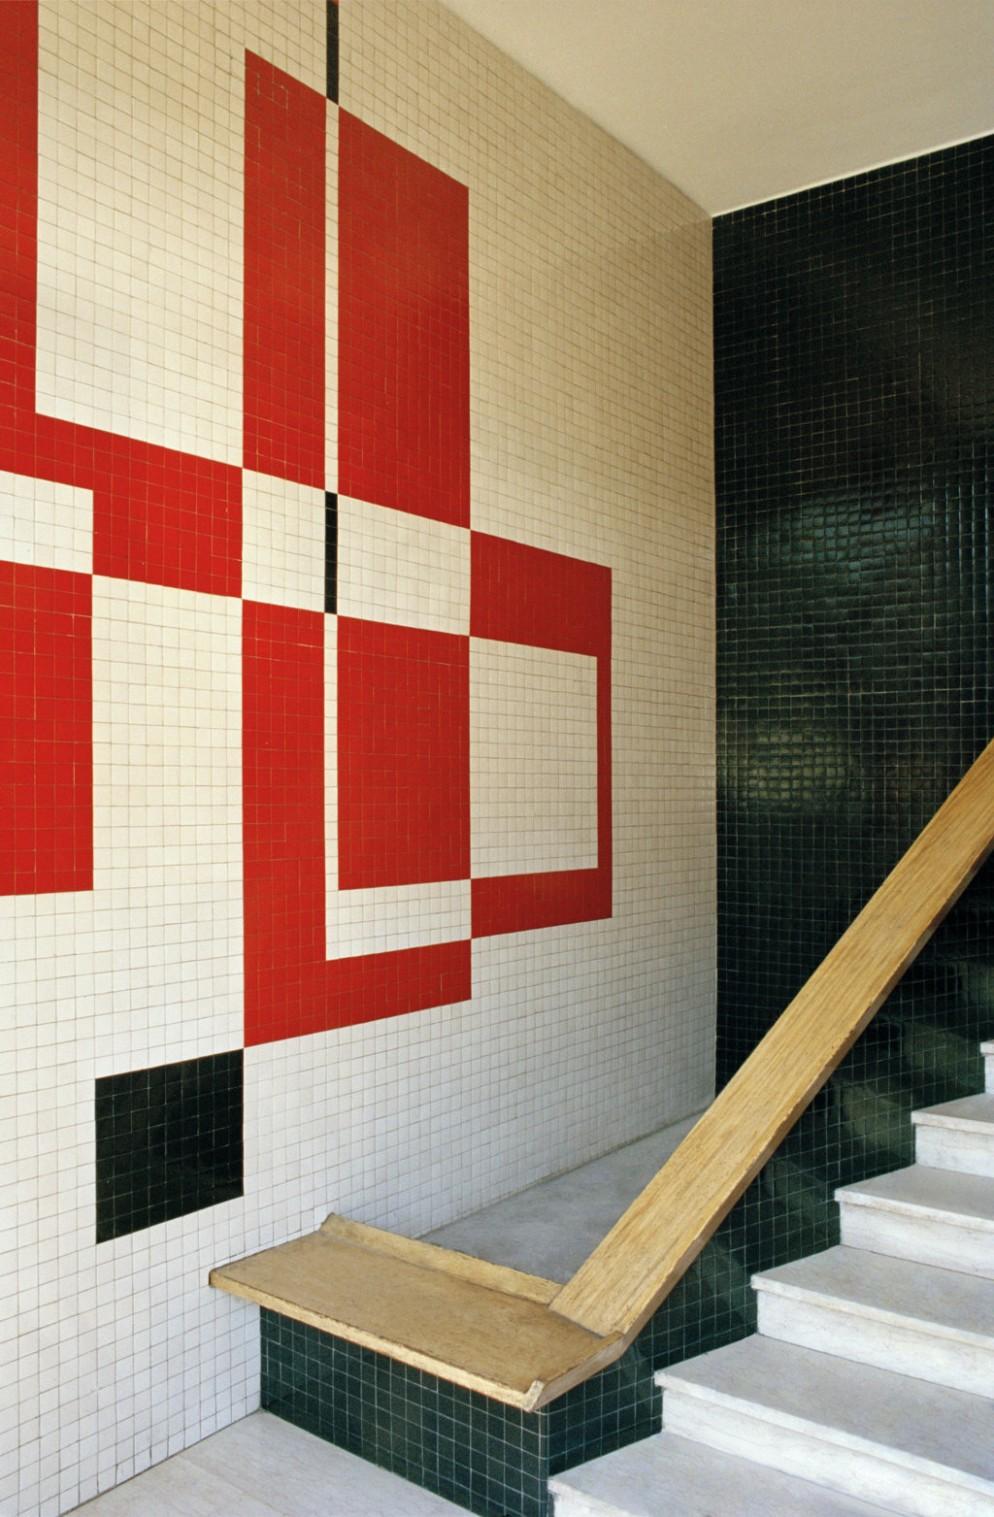 milano-architettura- 017B 2 -ph_stefan-giftthaler-livingcorriere